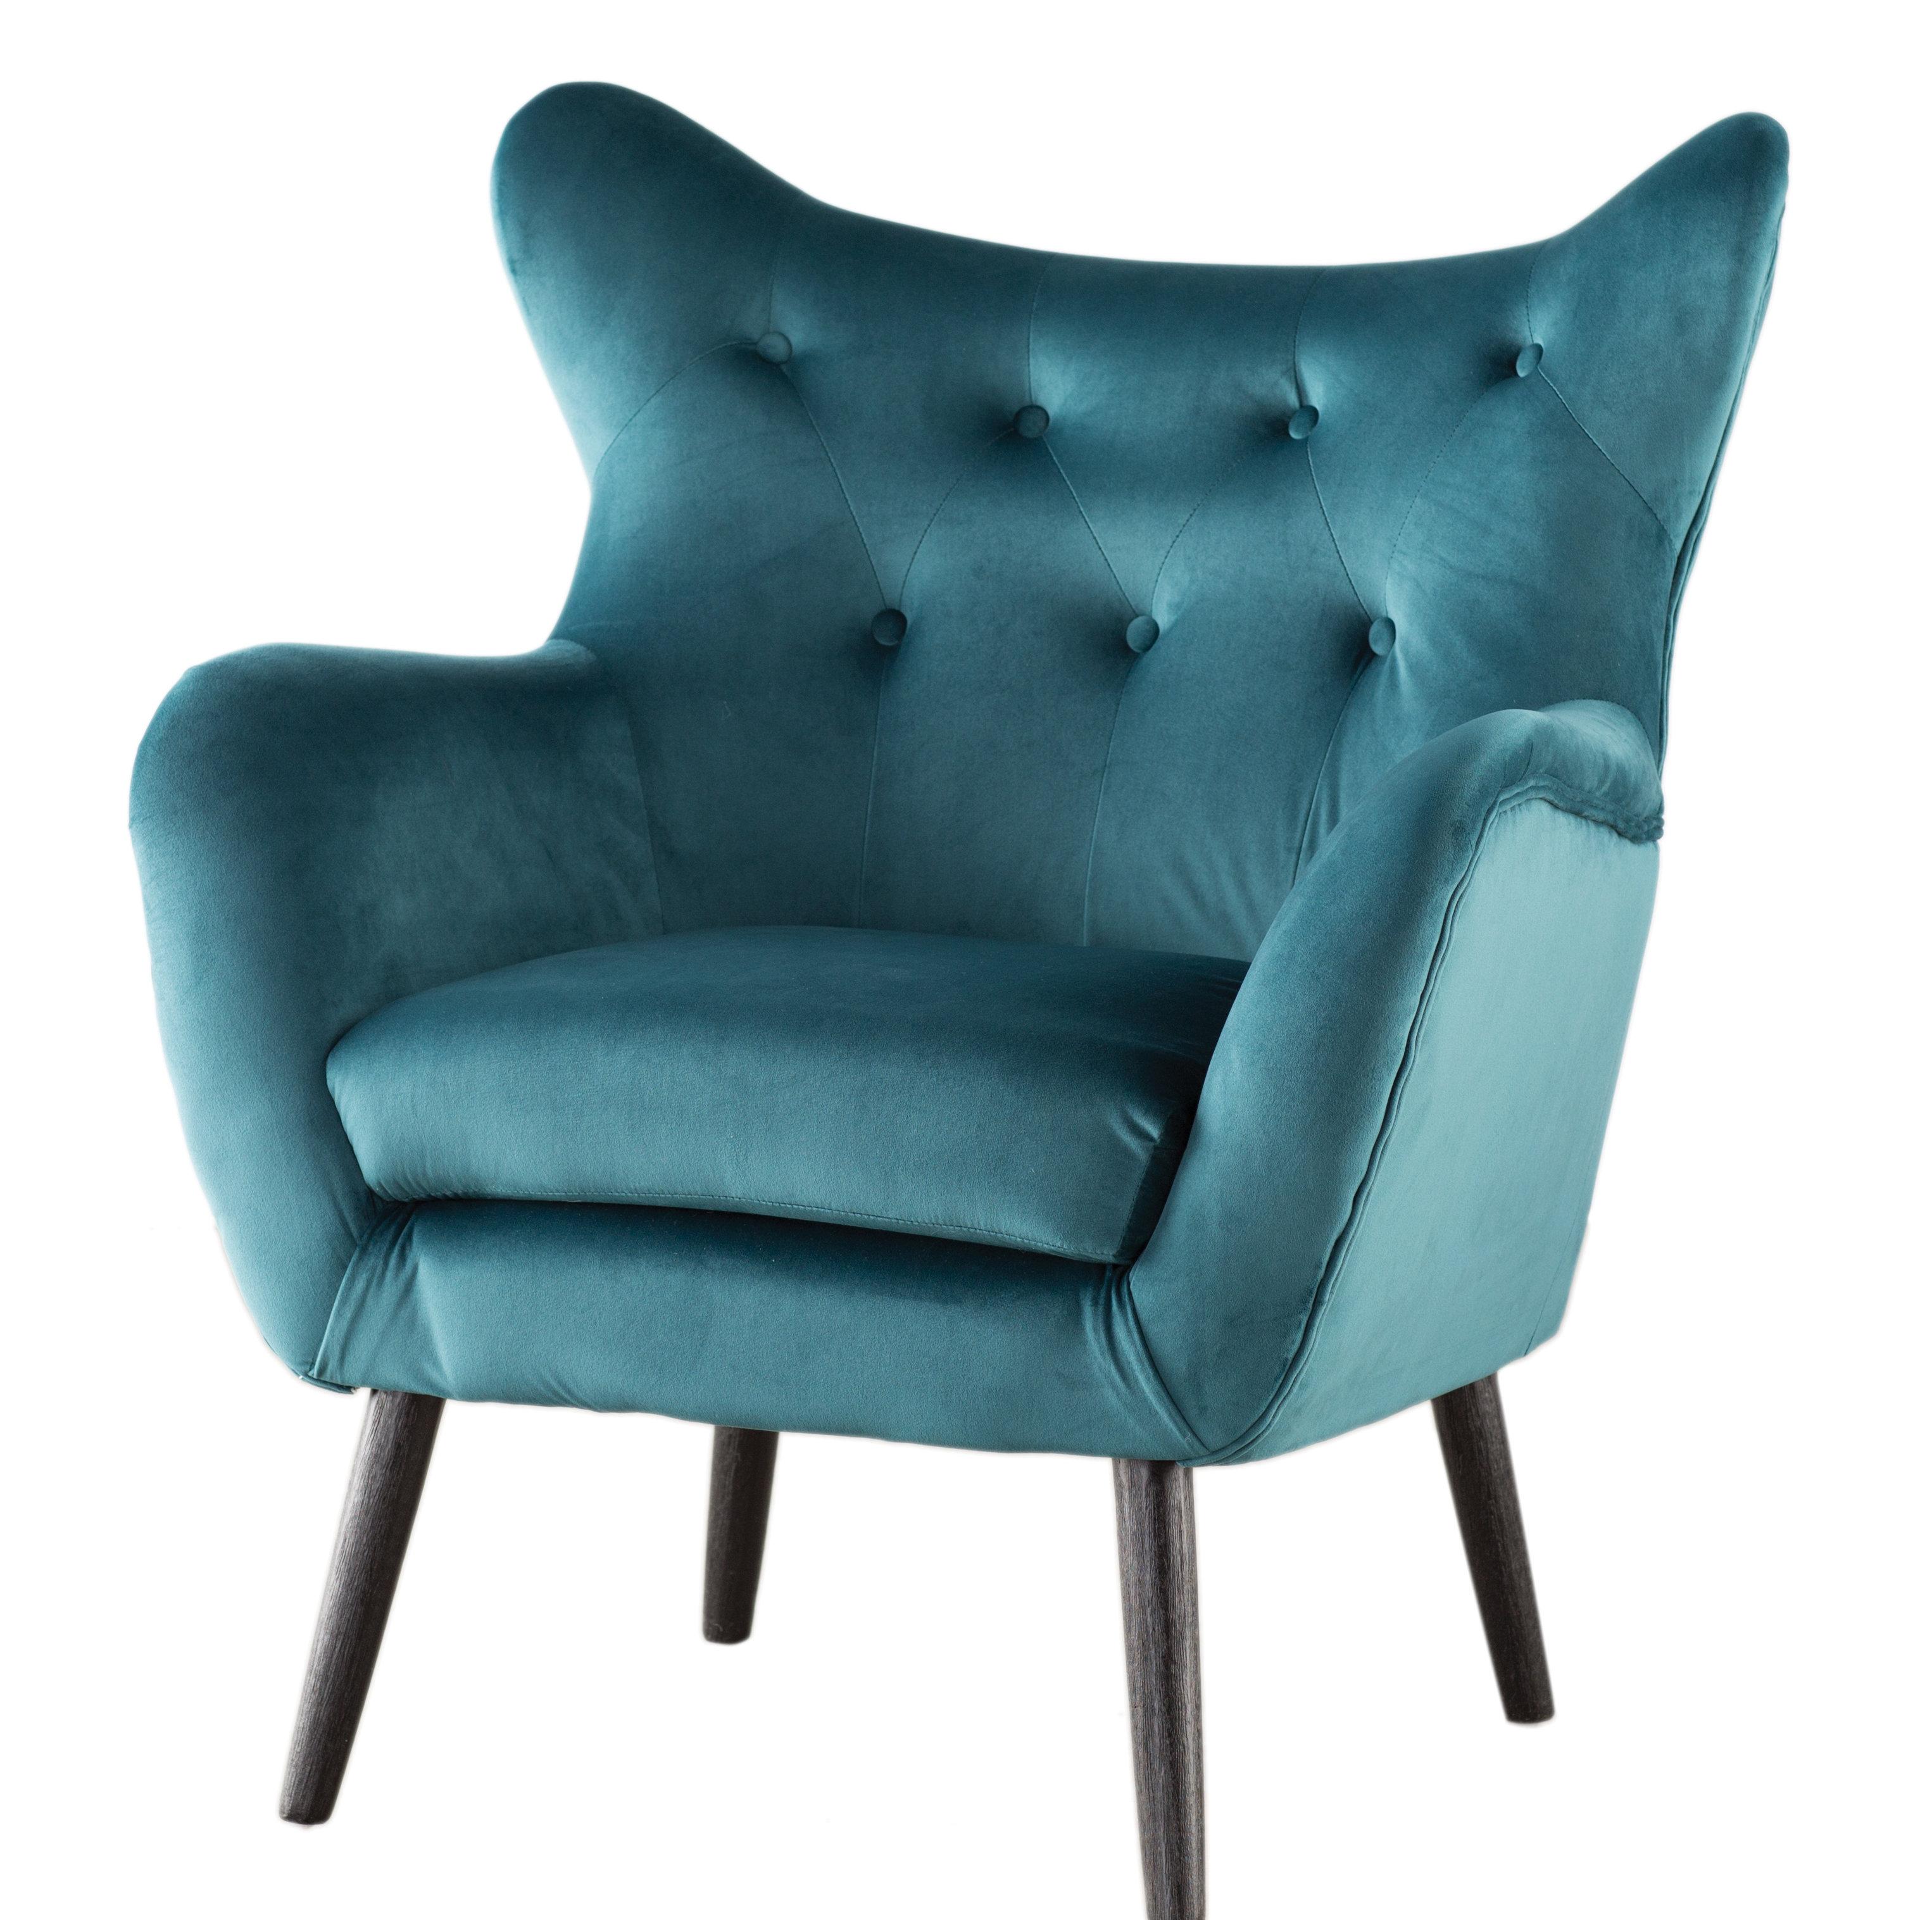 Colletta 21 Wingback Chair Reviews Allmodern